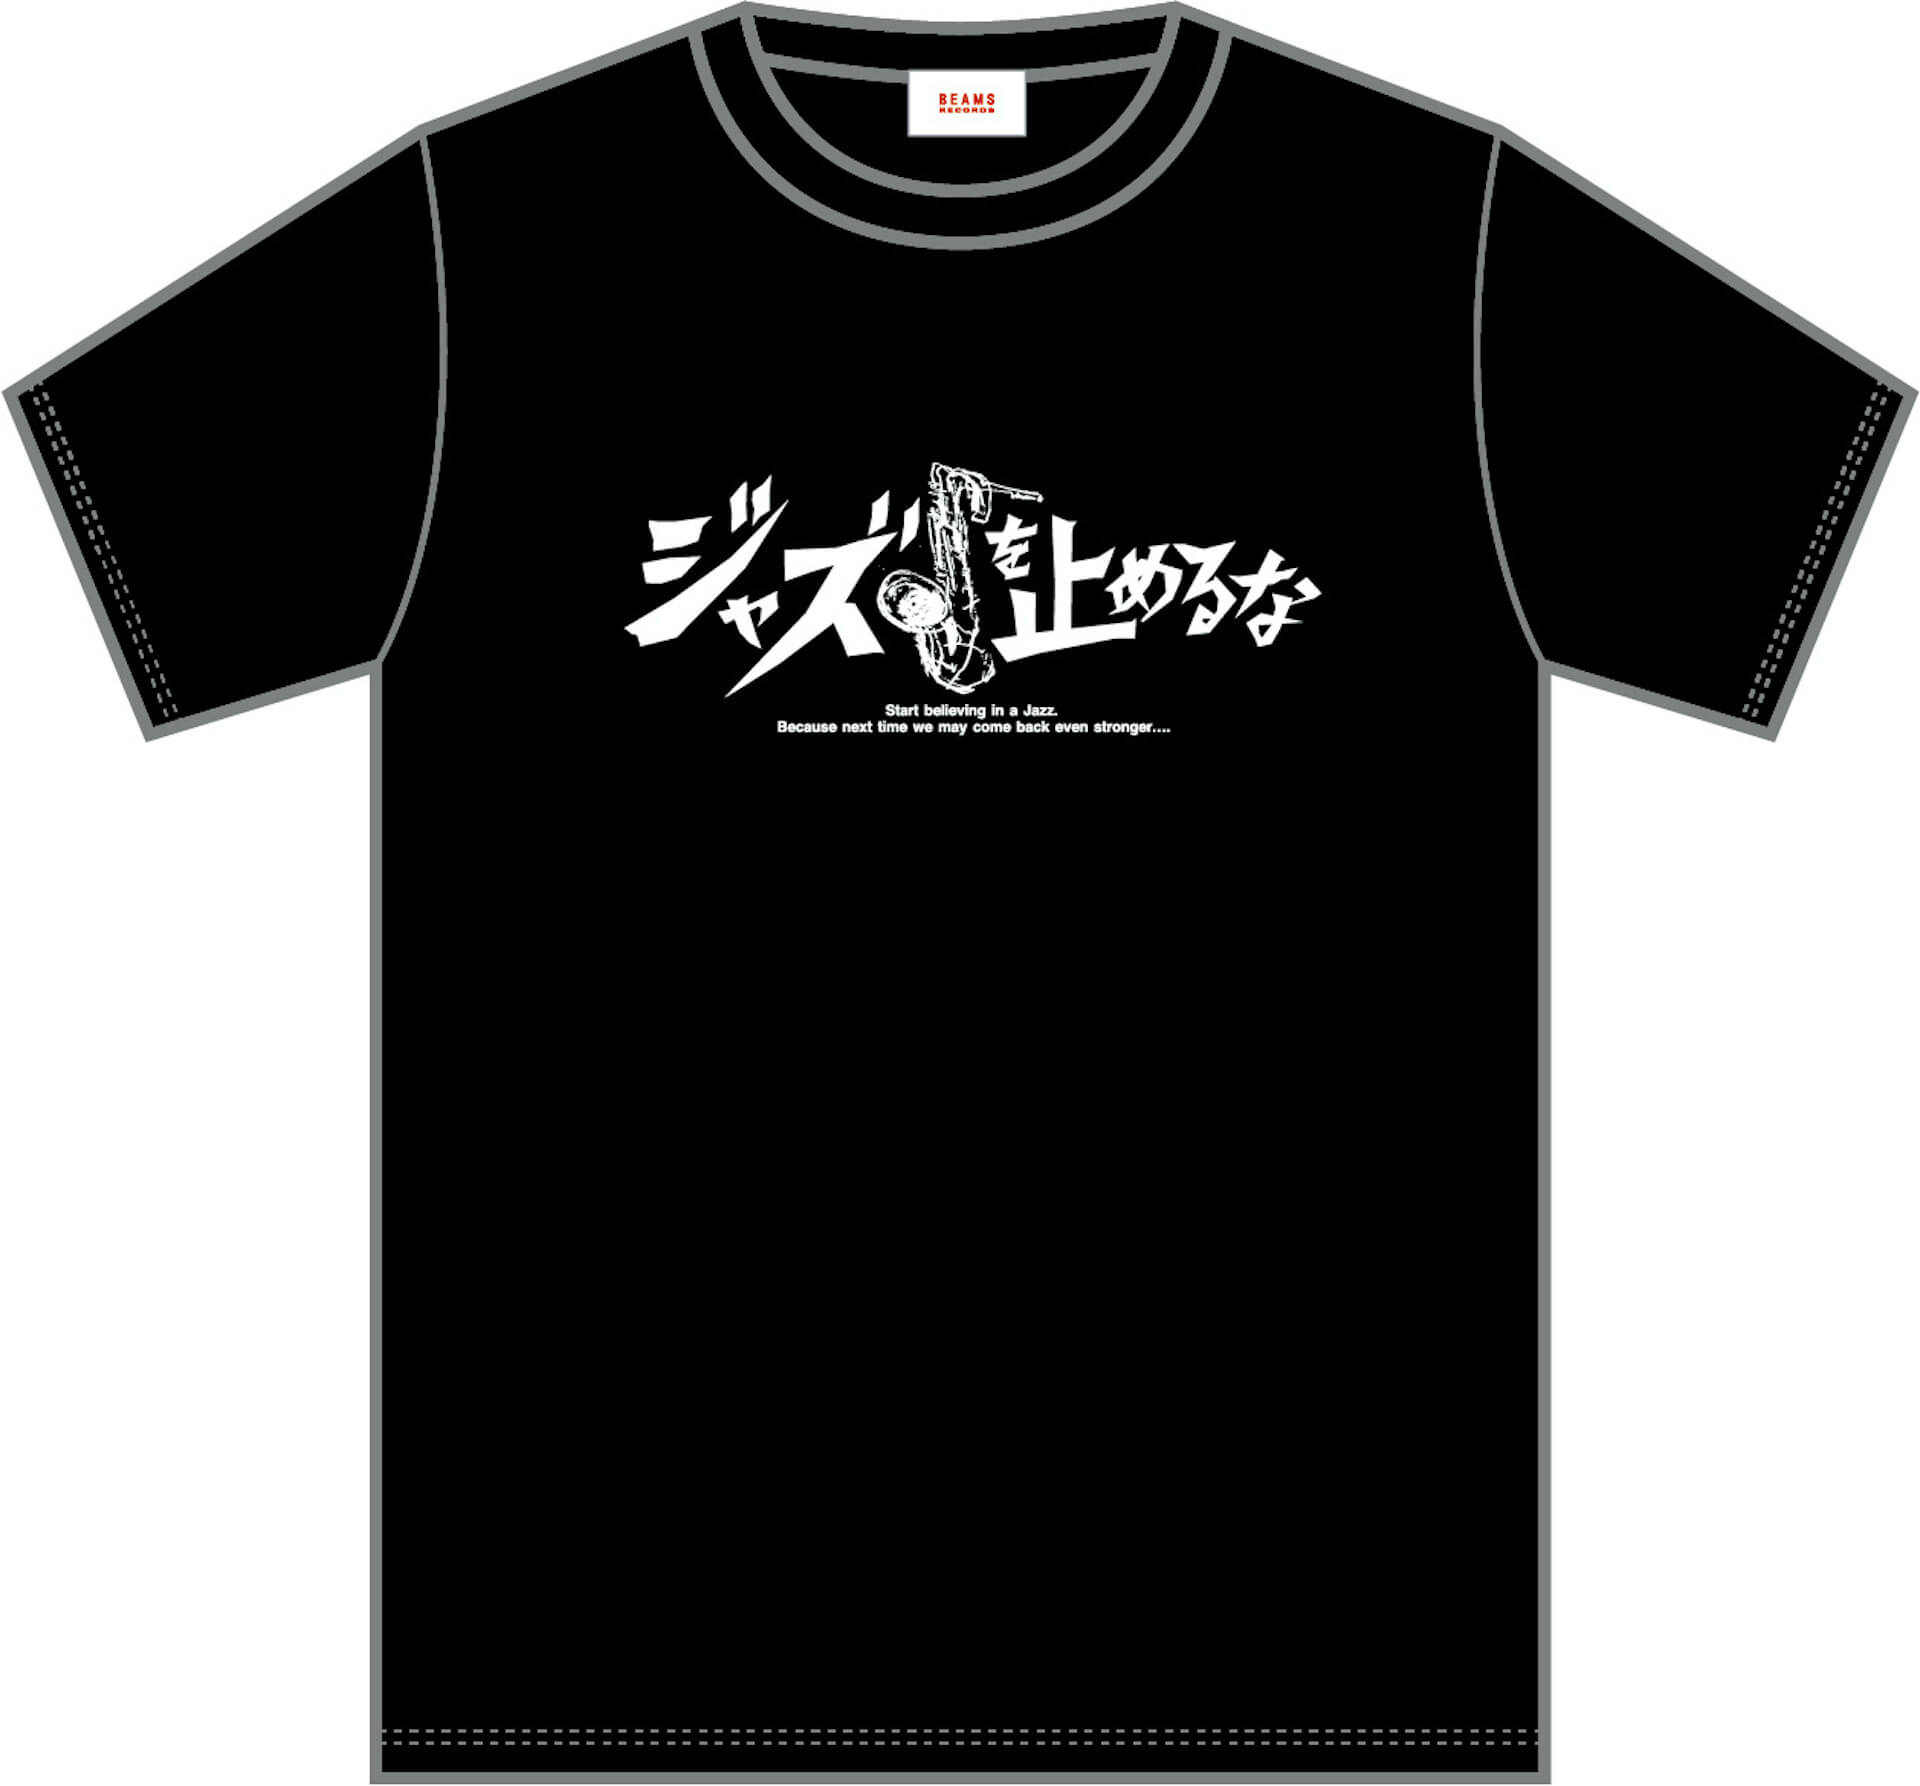 J-WAVE × BEAMS RECORDSのTシャツ第2弾が受注販売開始!本秀康、cherry chill will、TOWA TEIらが参加 music200612_jwave_beamsrecords_05